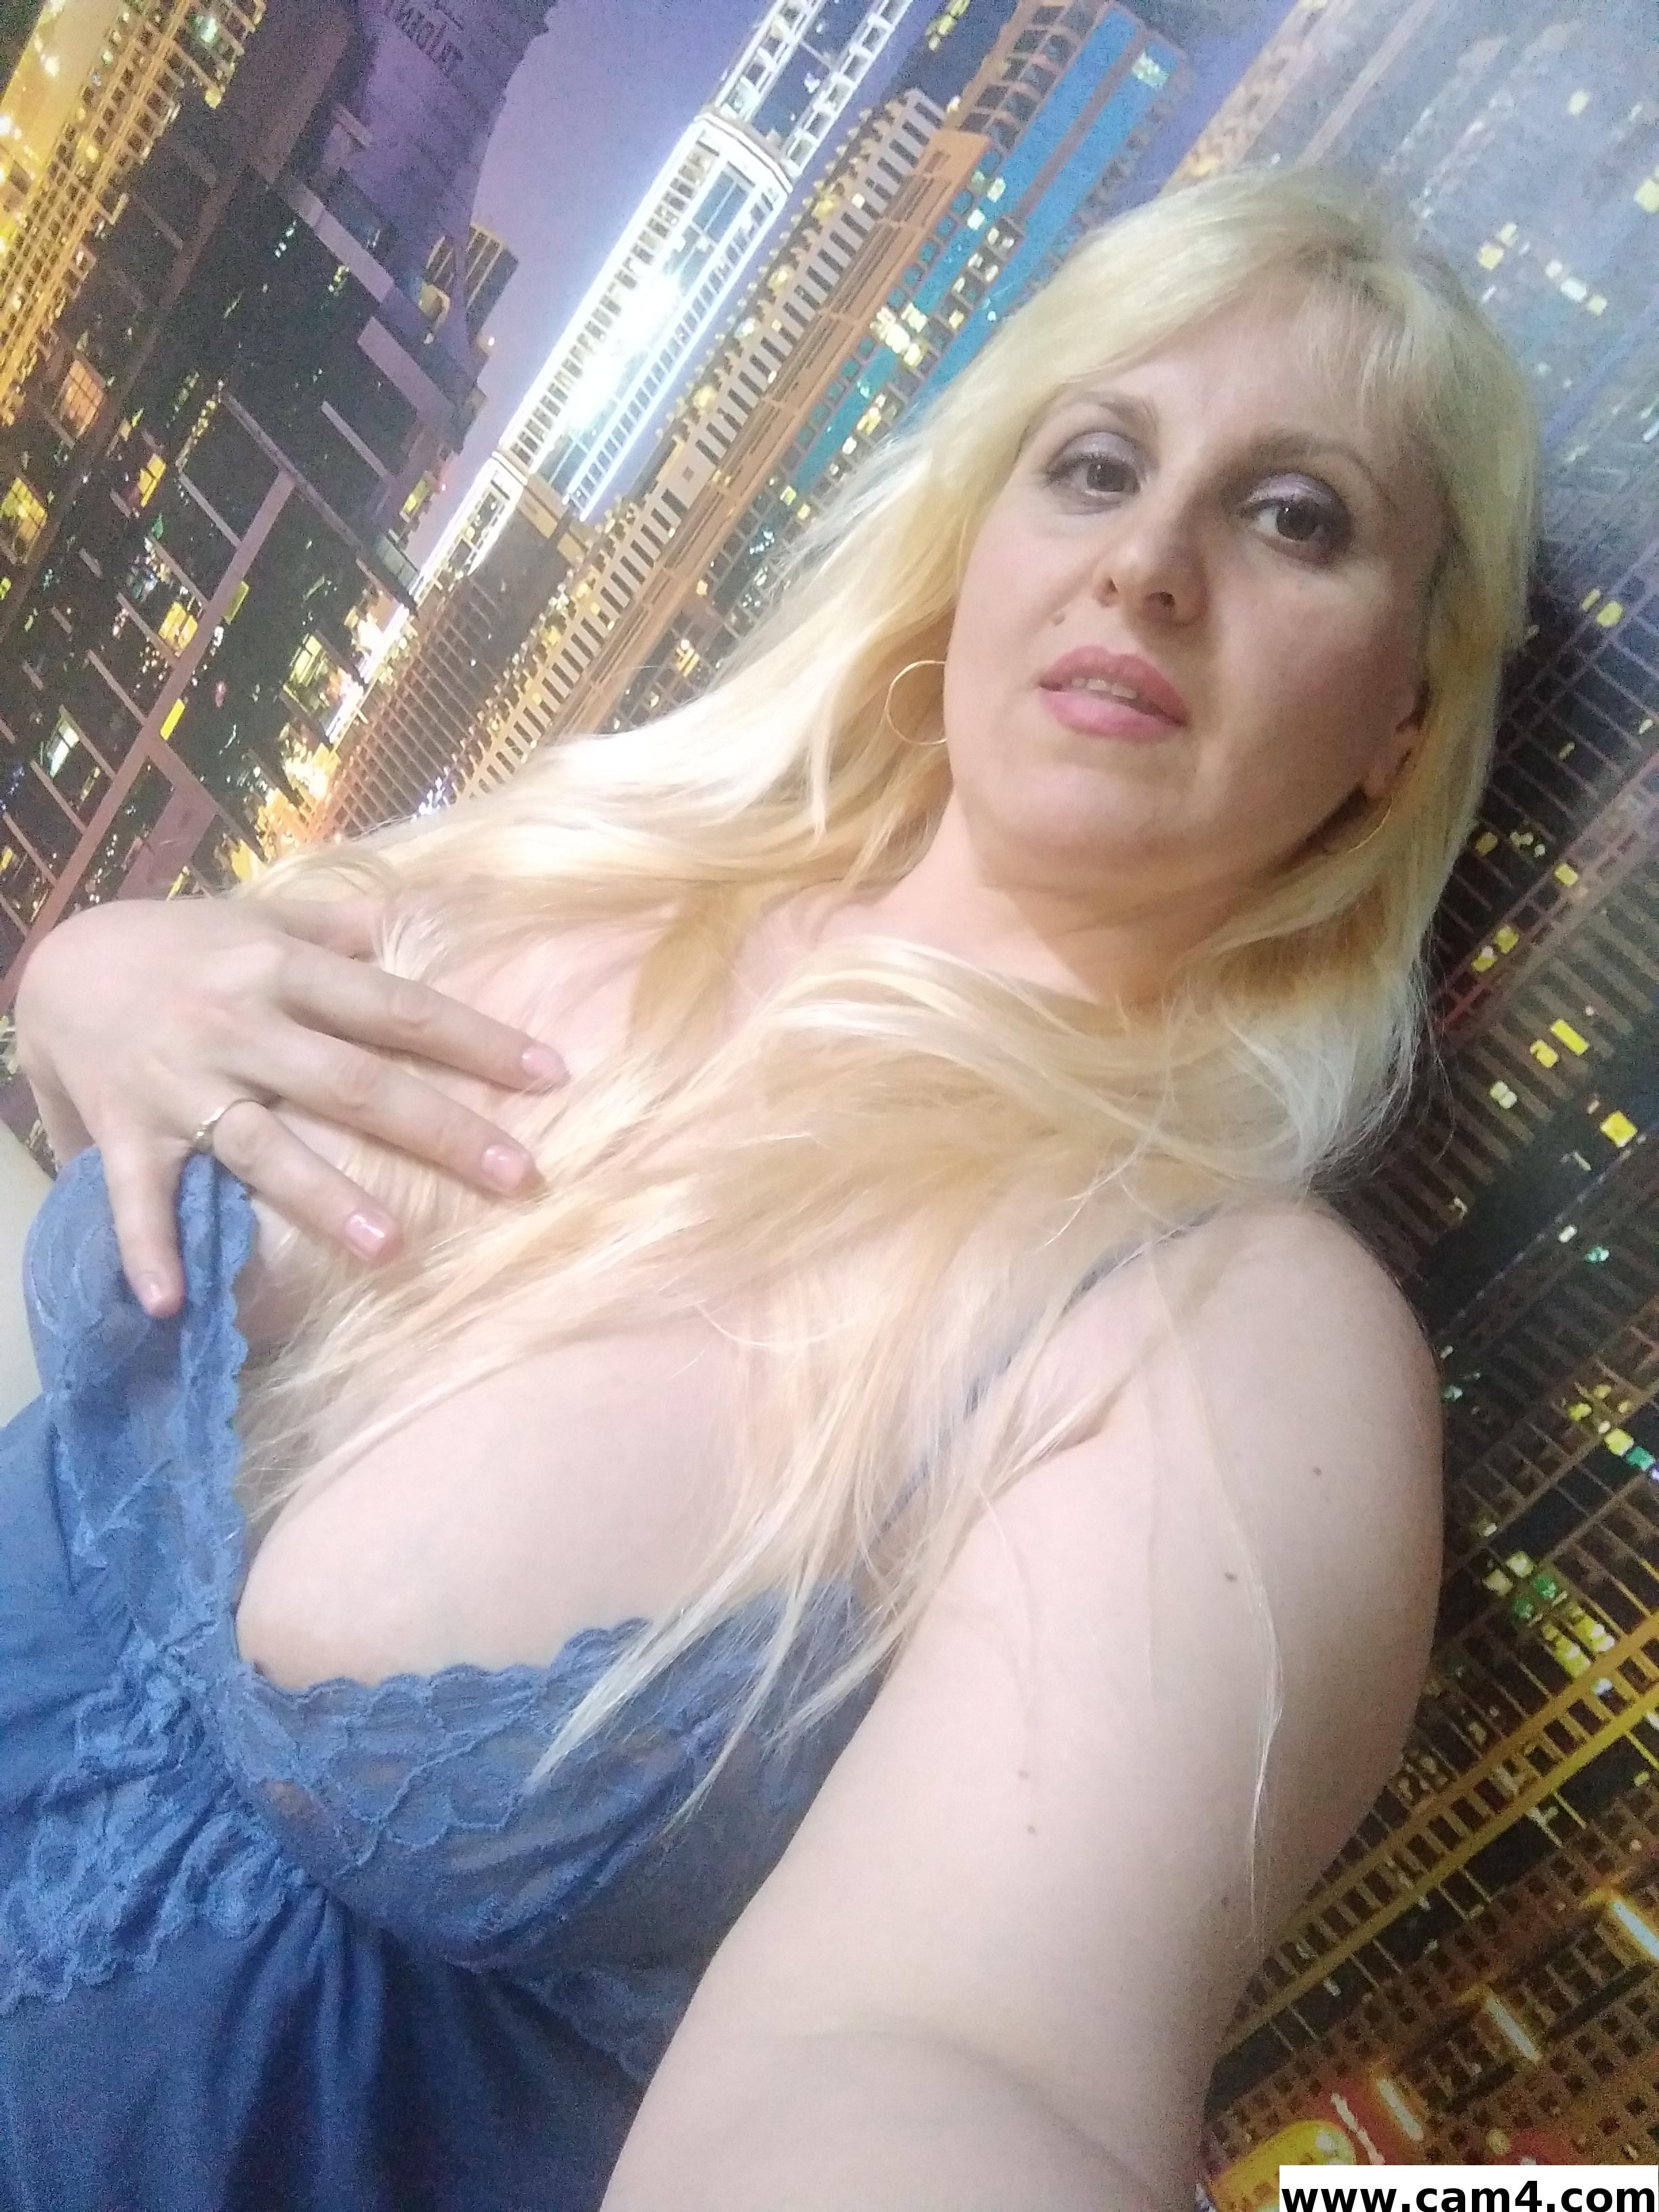 Blondabella?s=feiq5vn6dkie6jrcqje+4c0ypedcubcuwbpdujpy2ro=